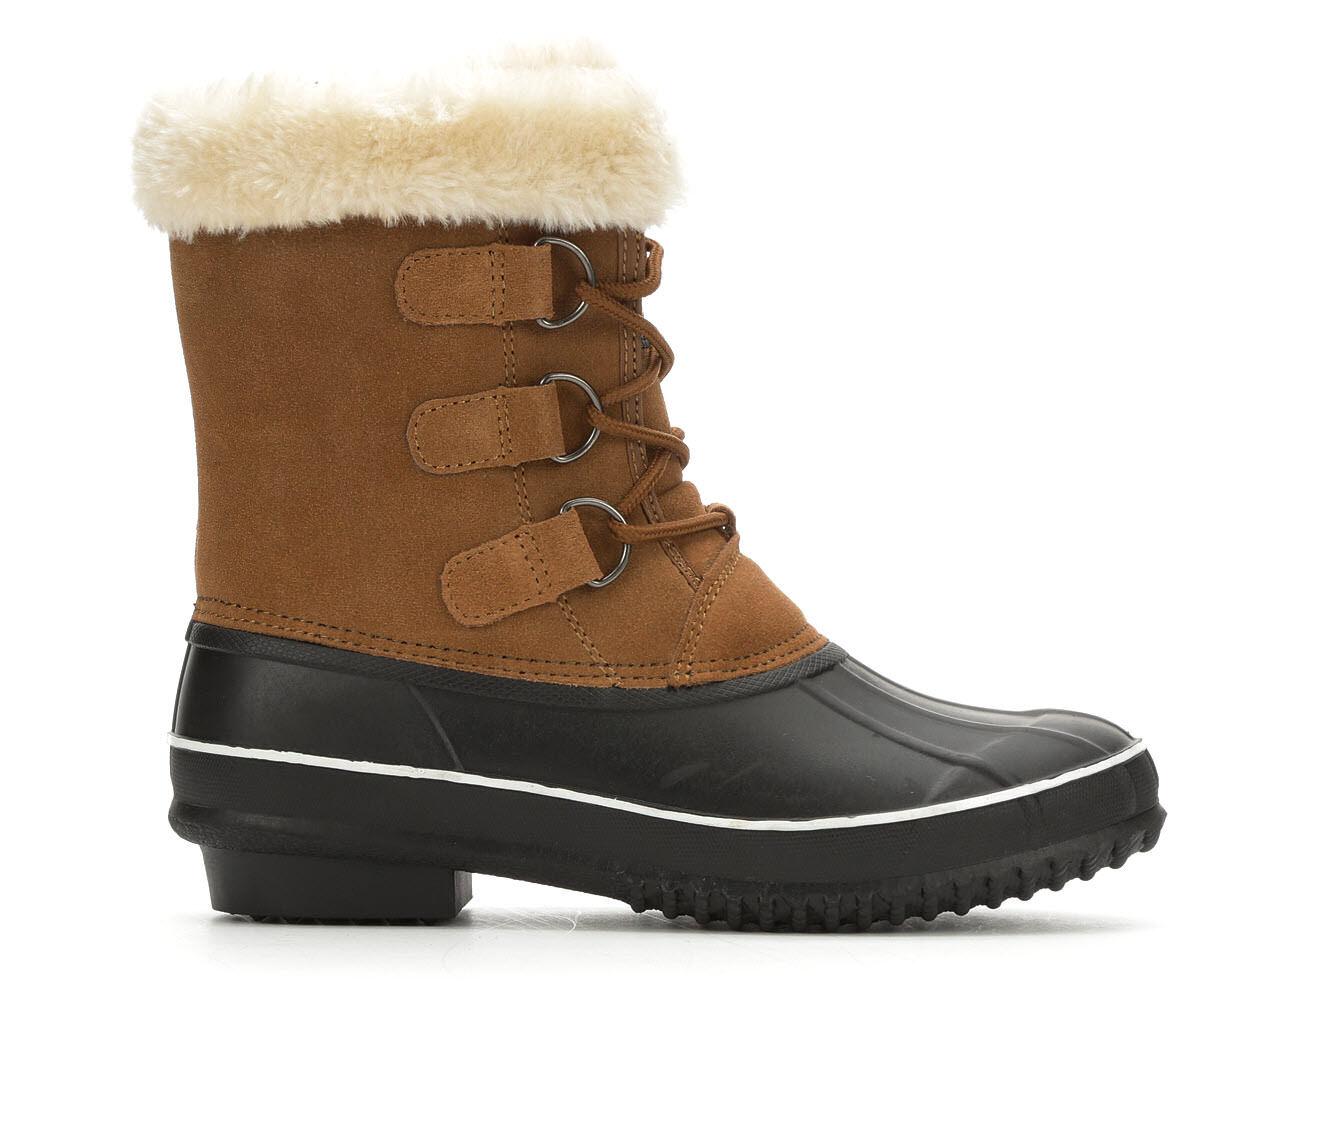 Women's Itasca Sonoma Erin Duck Boots Tan